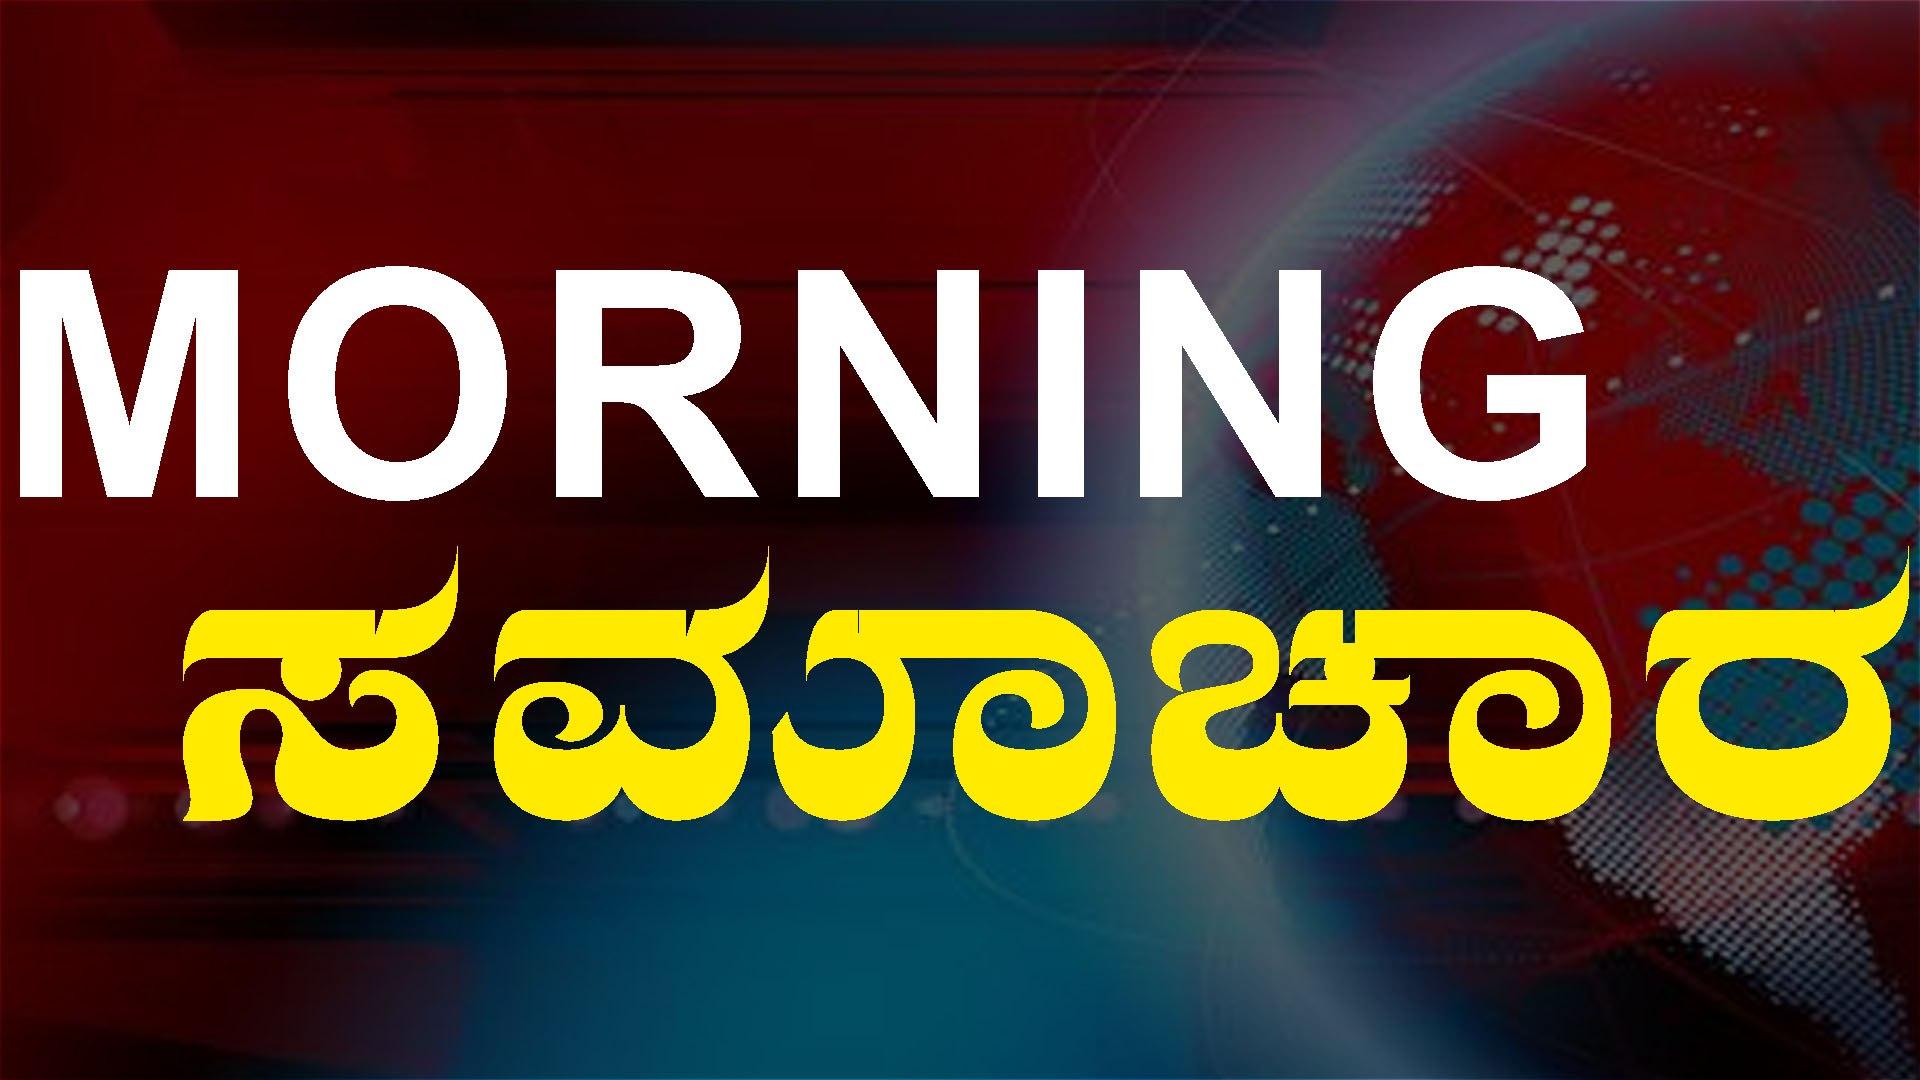 Morning News Updates